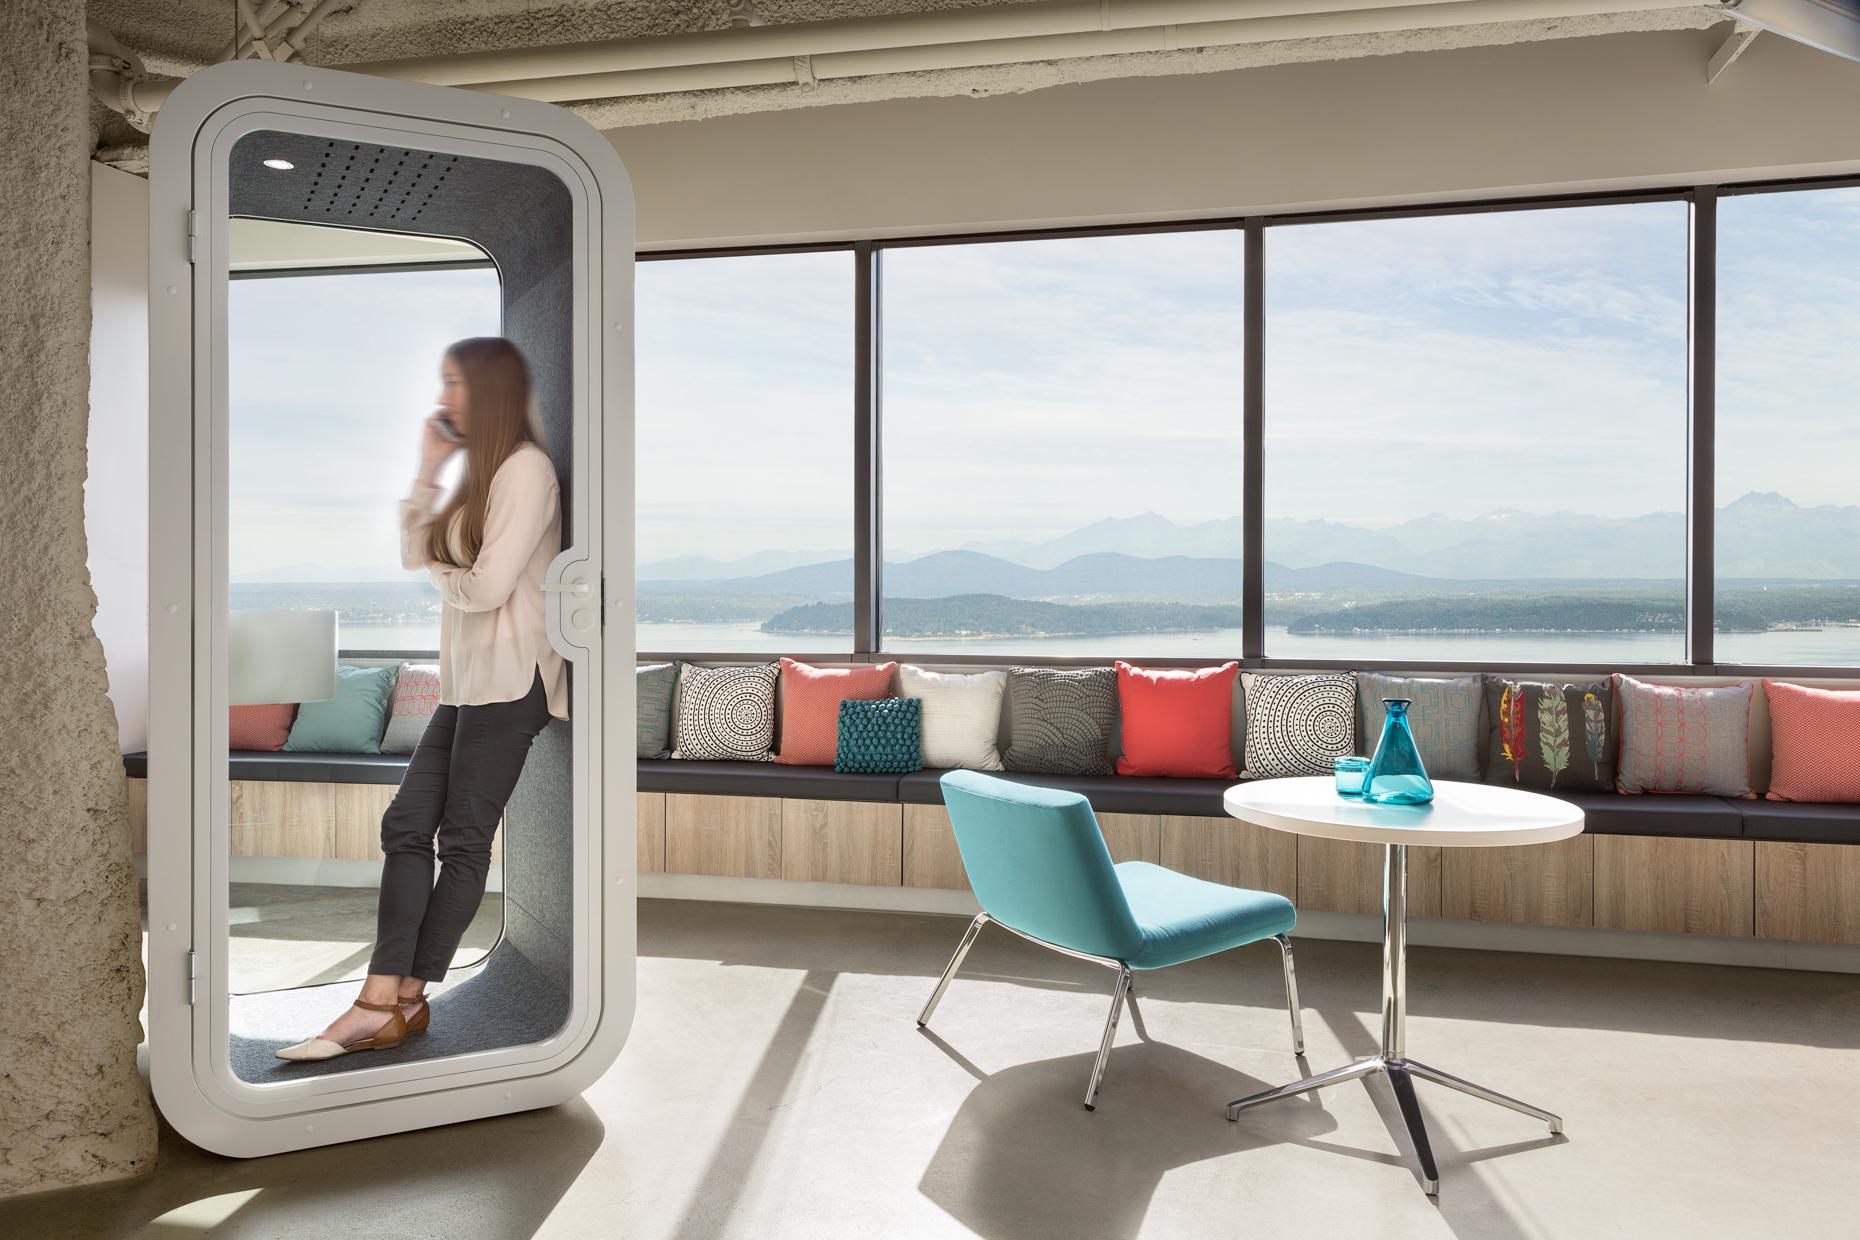 Unispace Seattle Office. Design by Unispace. Copyright Trent Bell / Unispace.